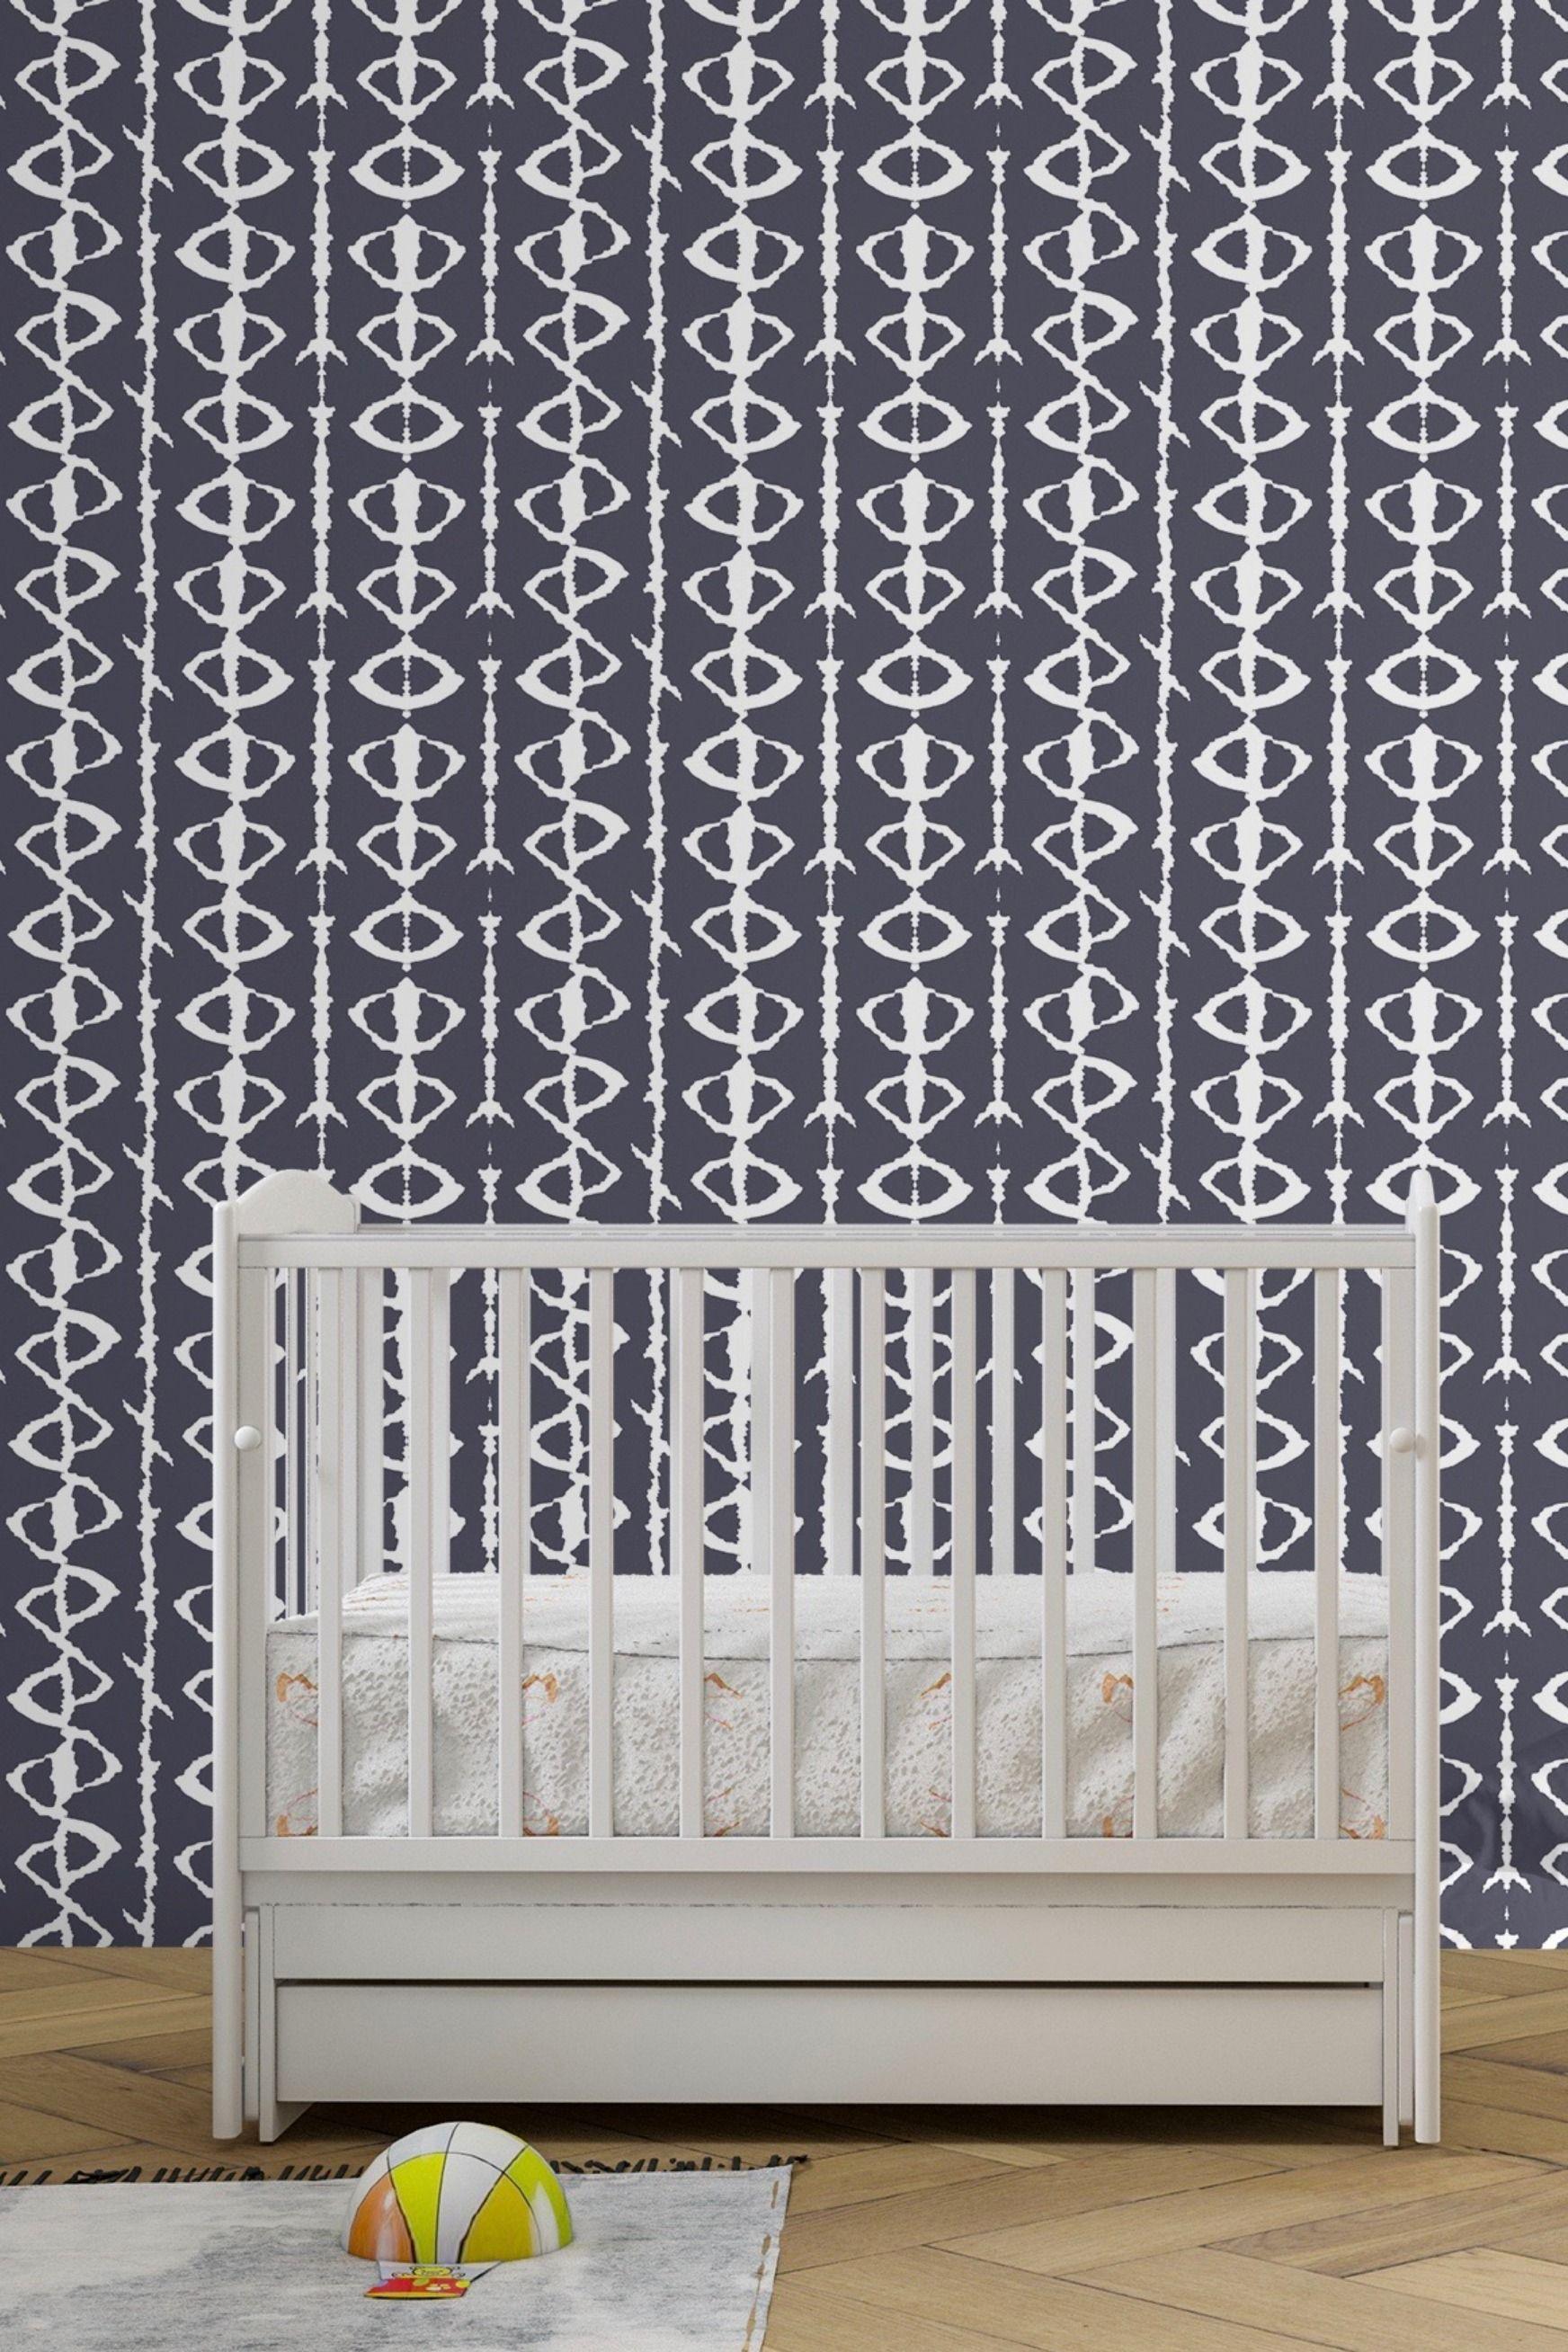 Navy Blue Ikat Peel And Stick Wallpaper Modern Nursery Peel And Stick Wallpaper Wallpaper